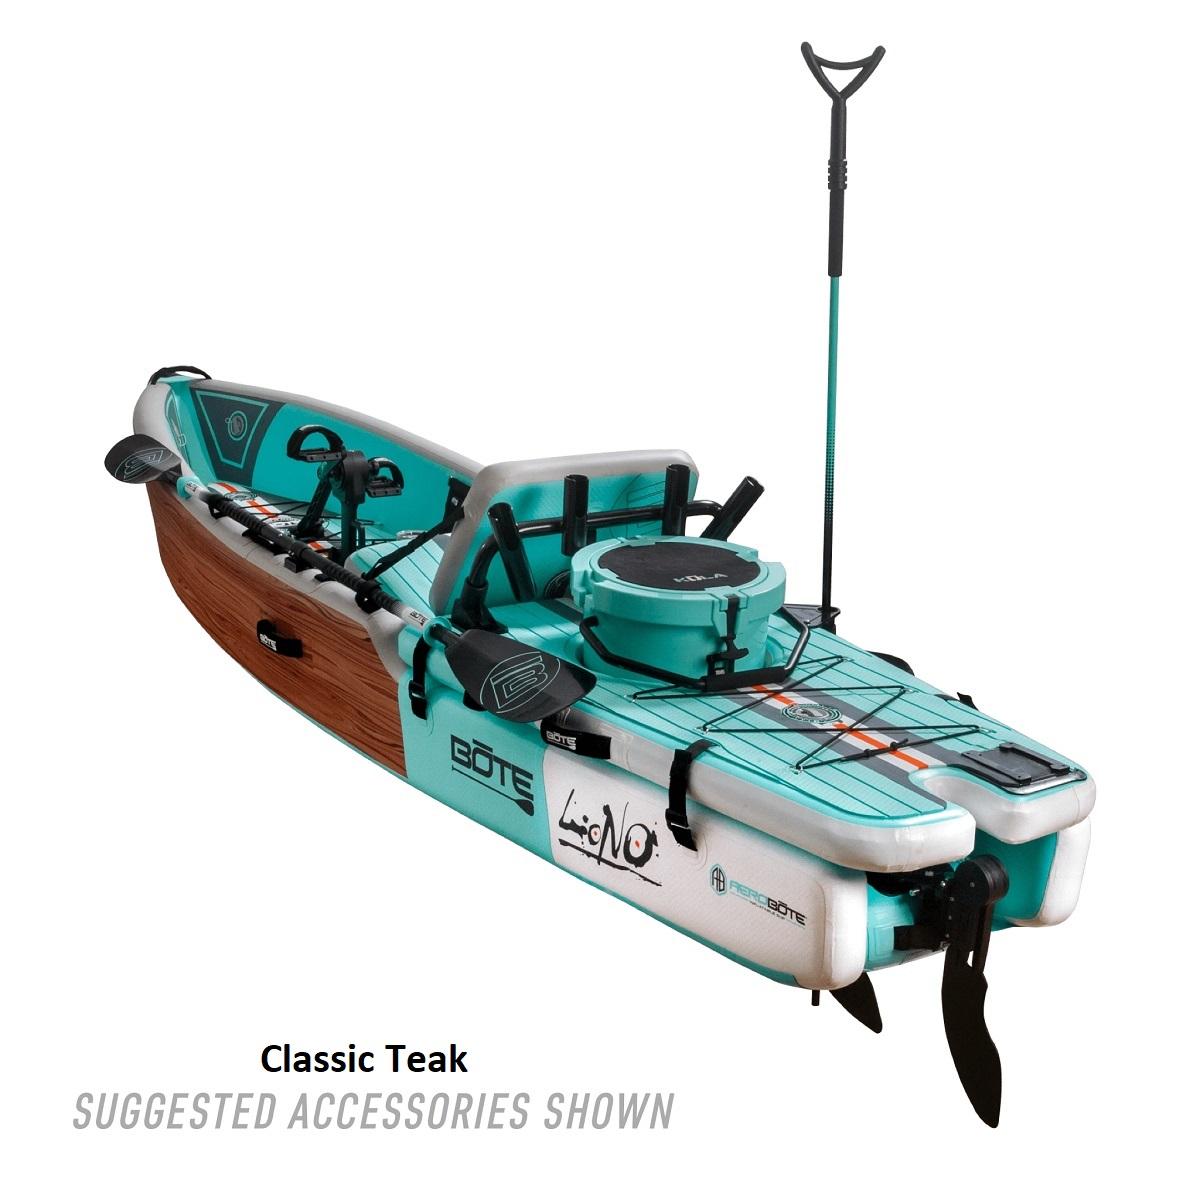 BOTE Lono Inflatable Kayak - Classic Teak 2